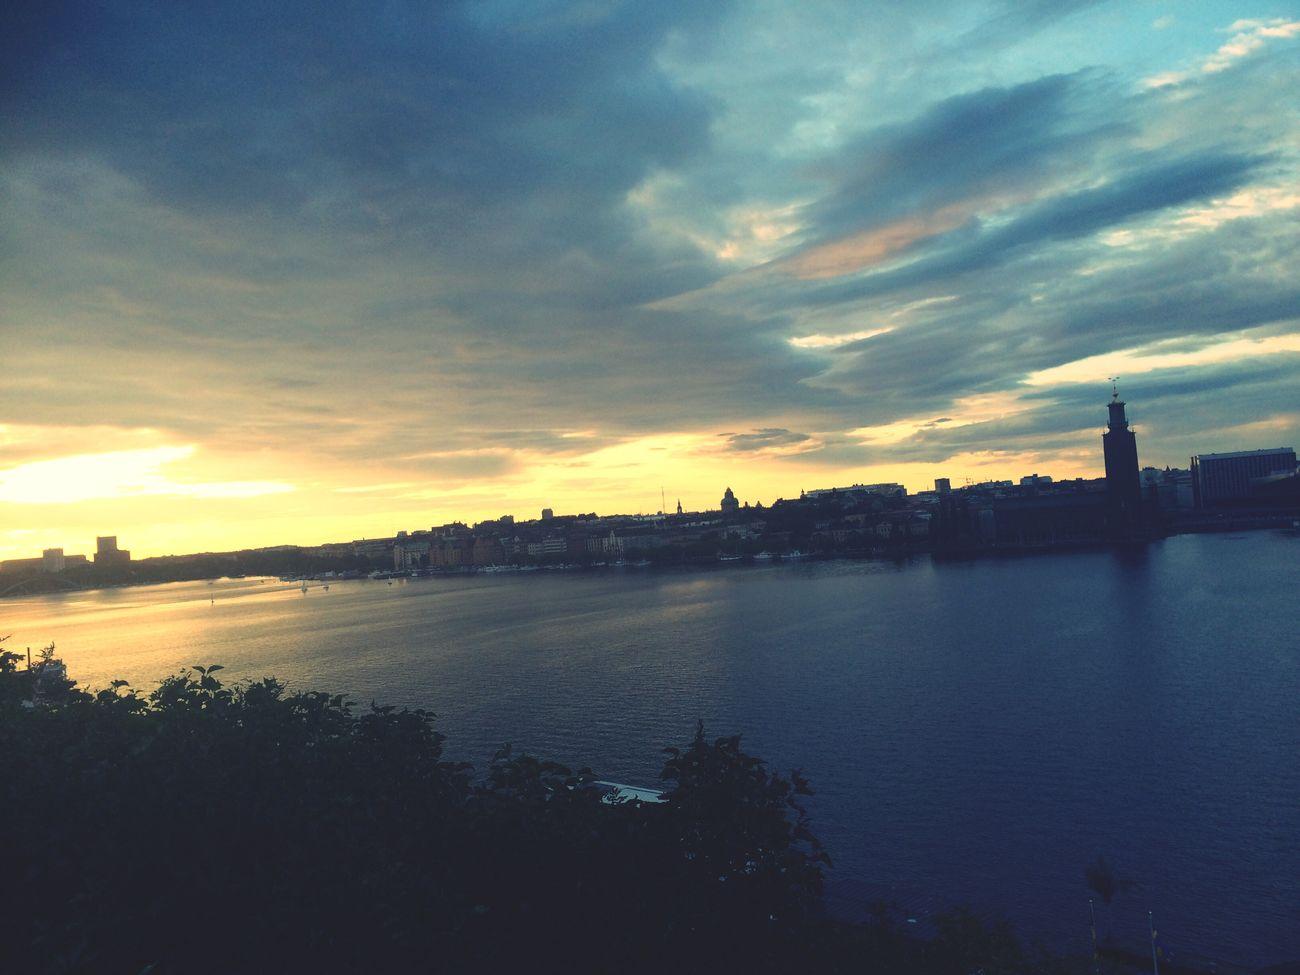 Stockholm, Sweden Stockhom Sun Set Relaxing